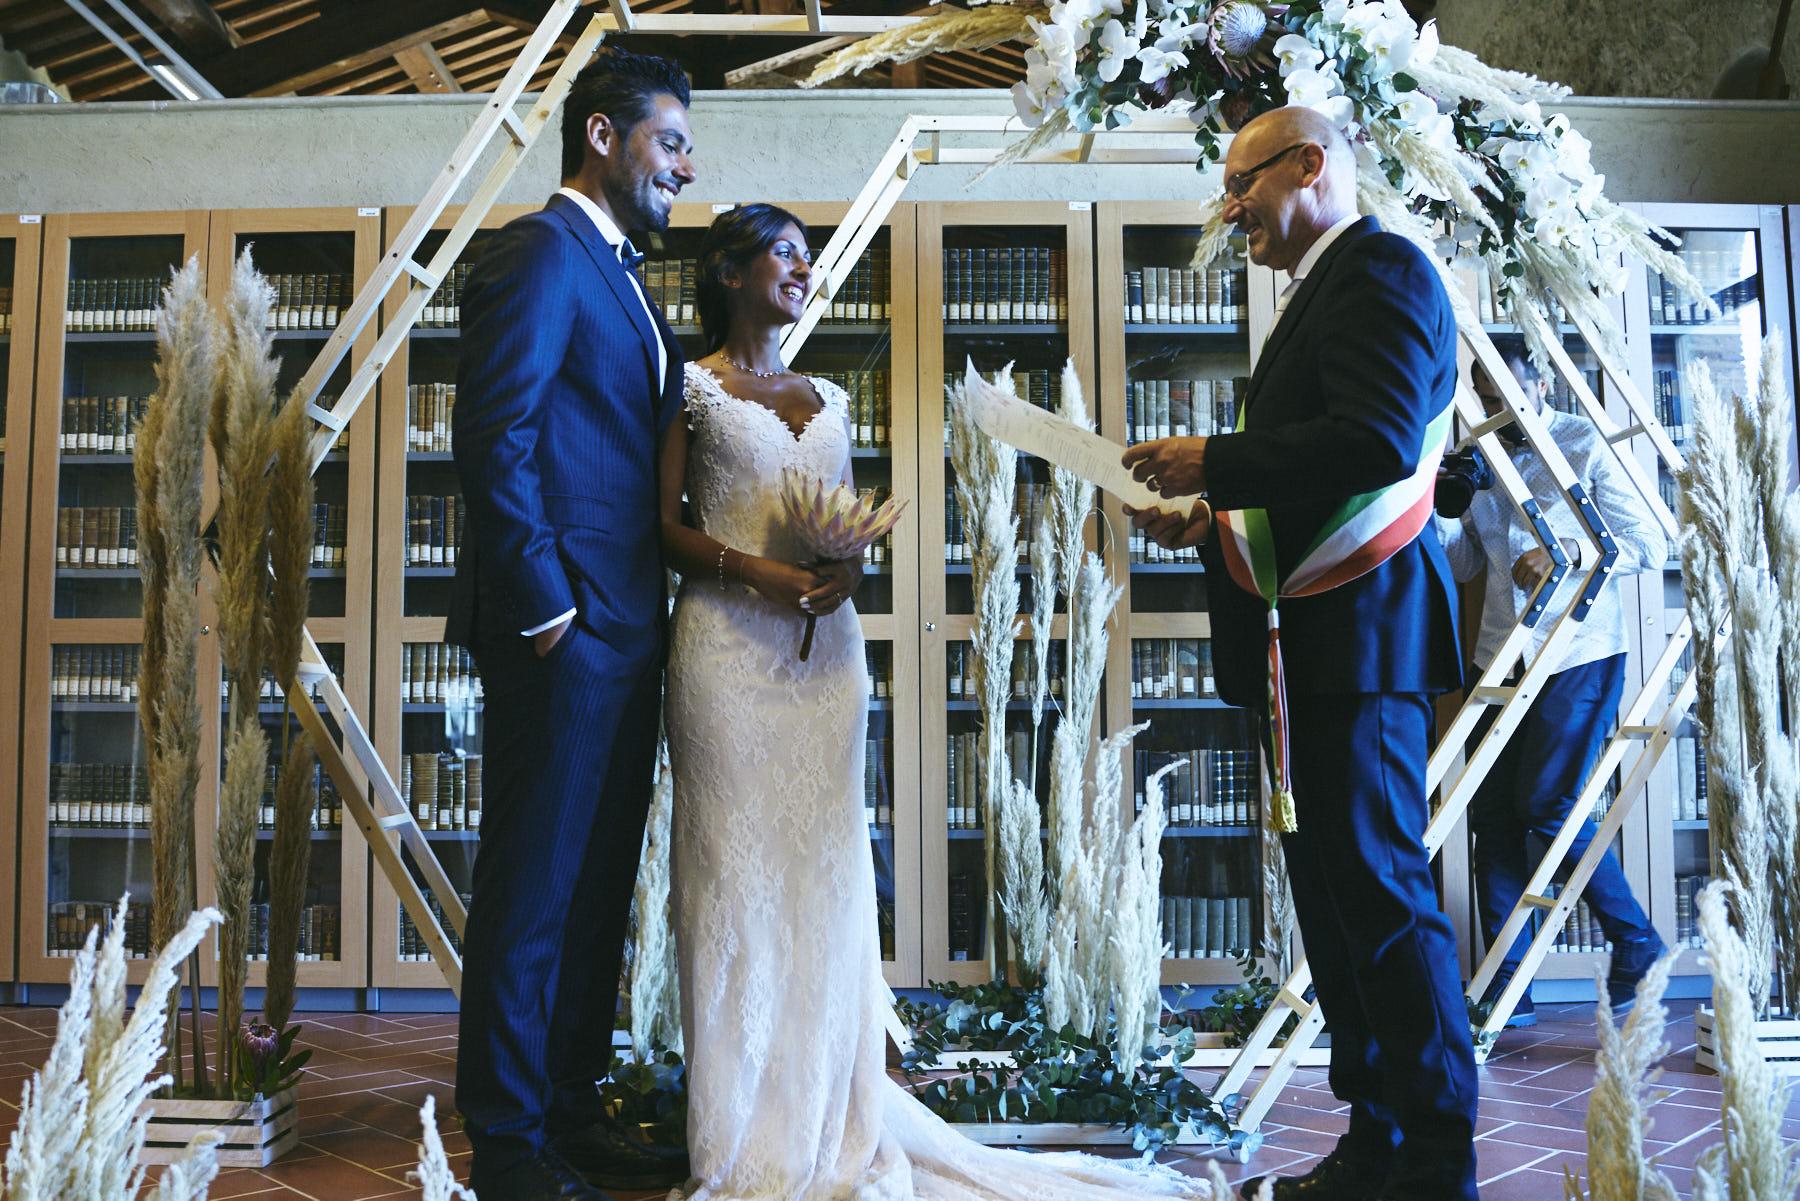 wedding_tuscany_maremma_30_frank_catucci